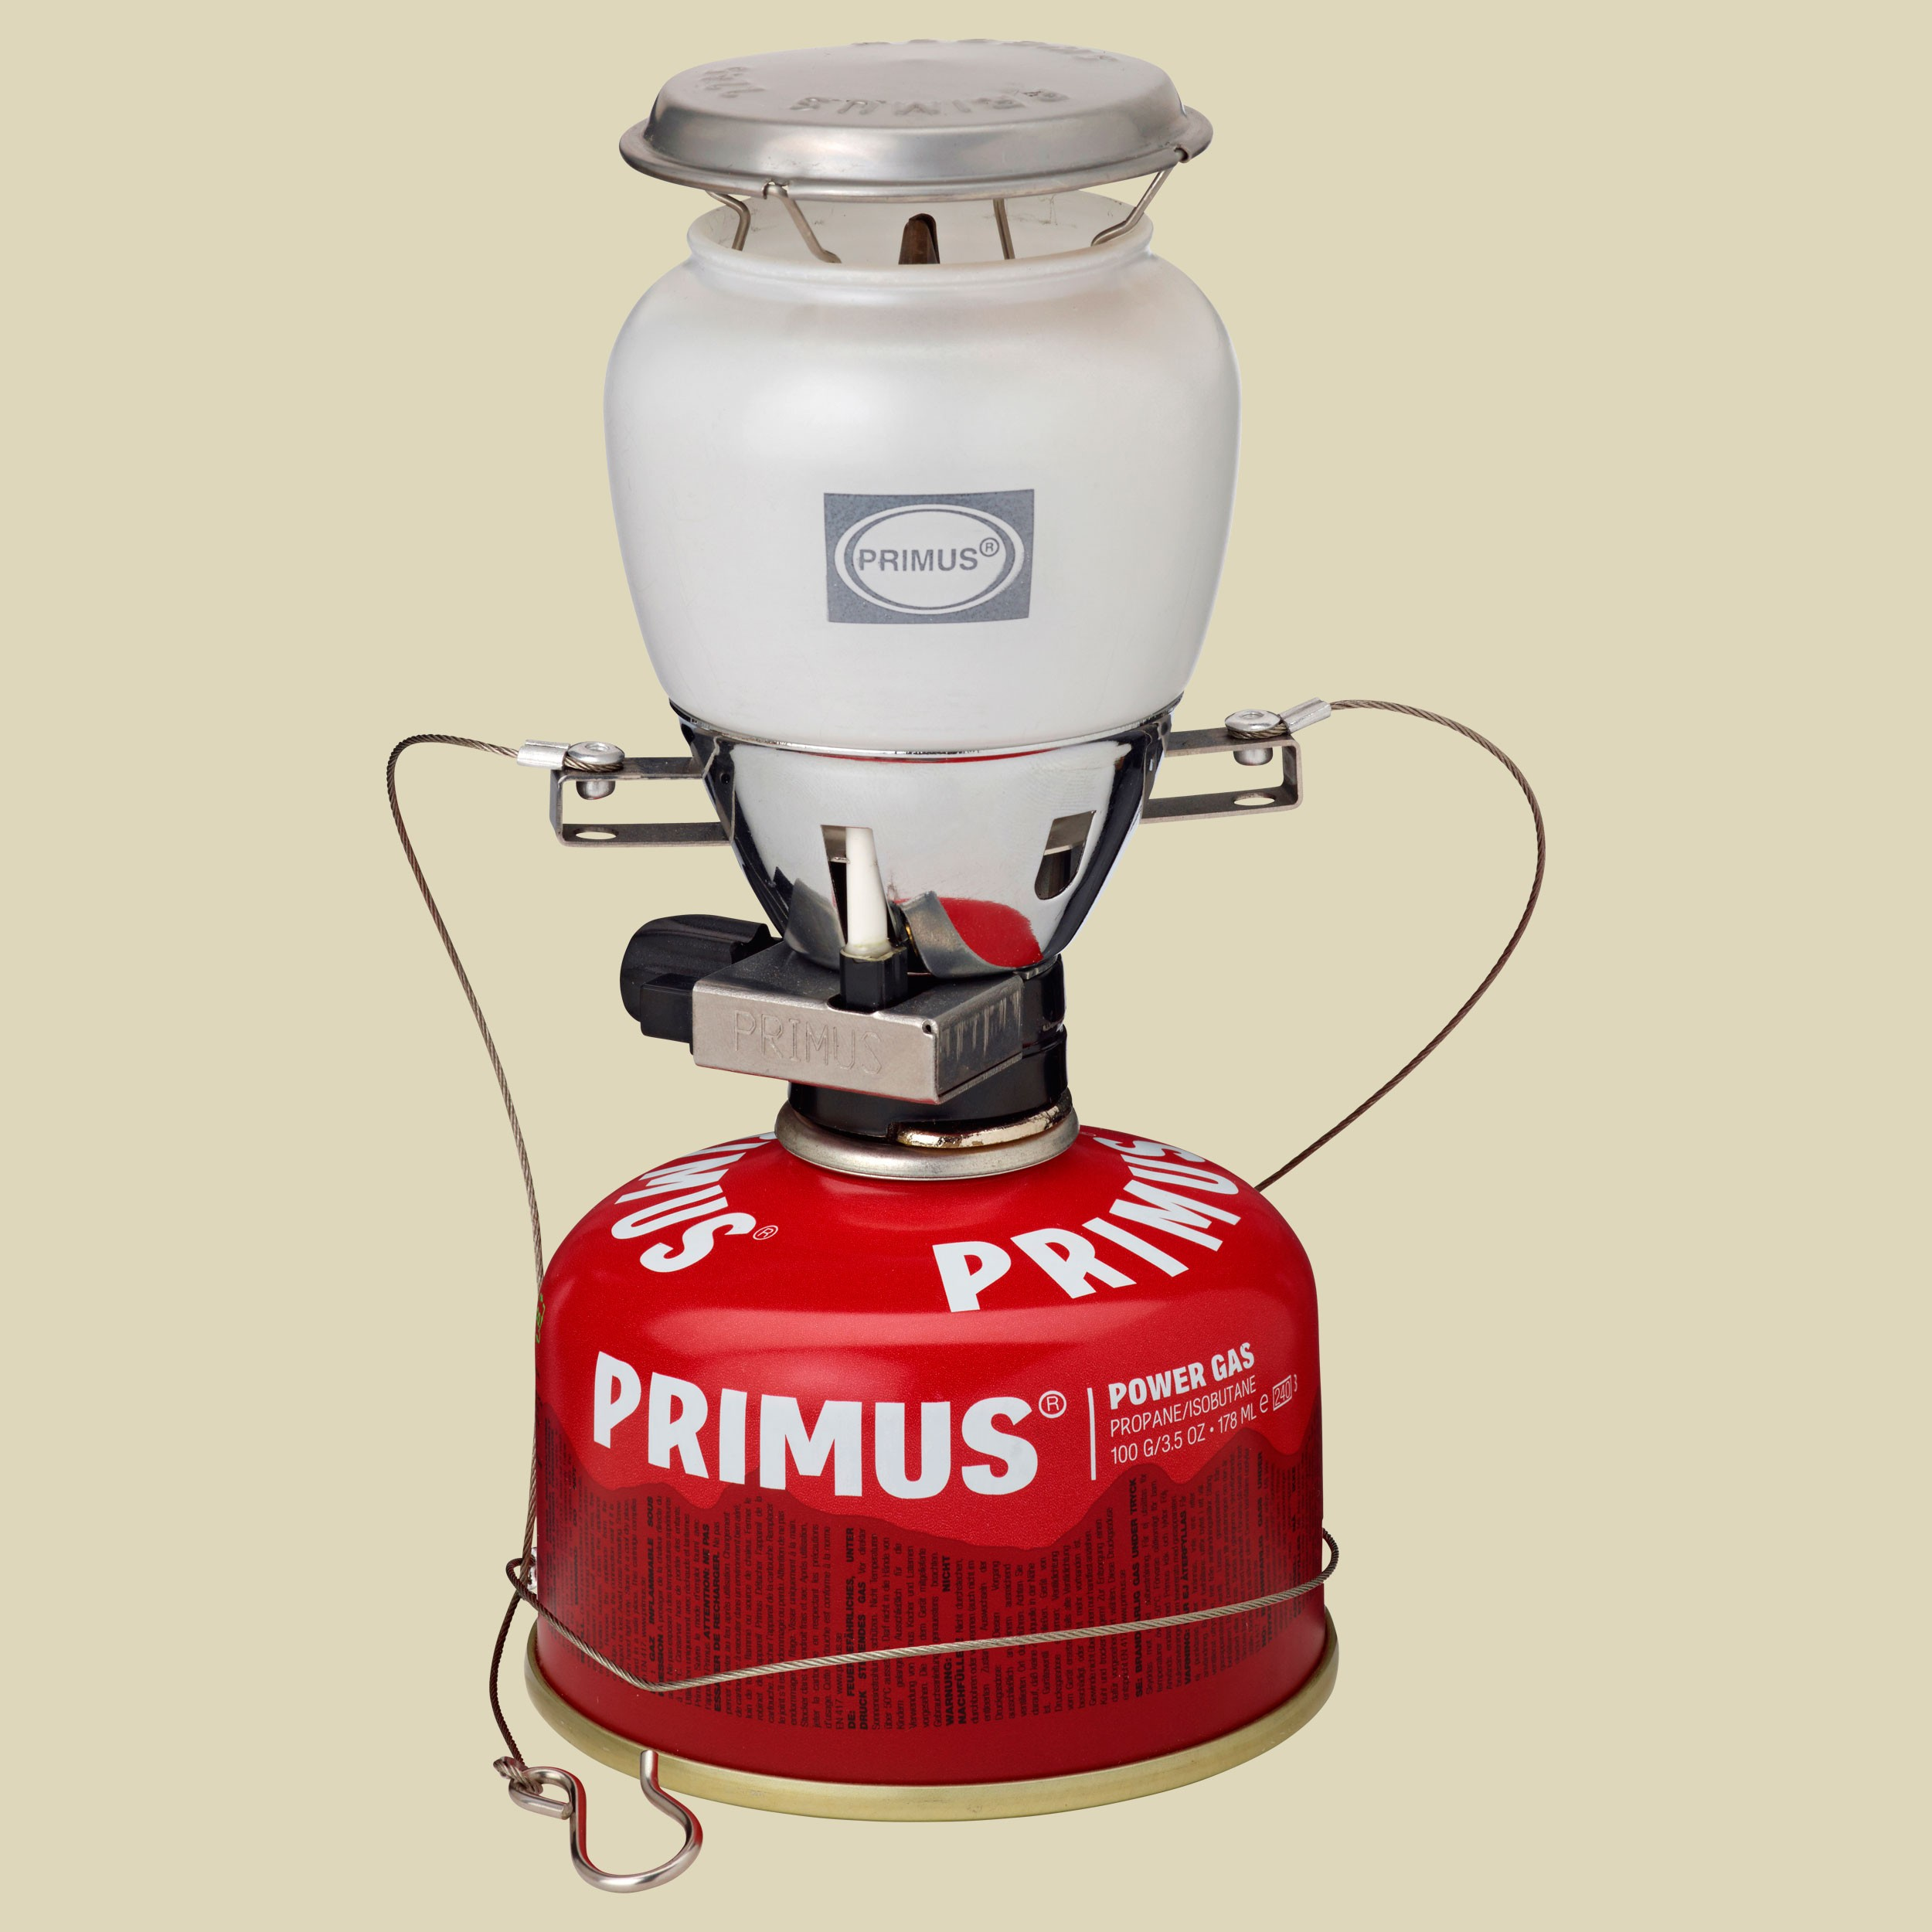 primus_224583_easy_light_red_fallback